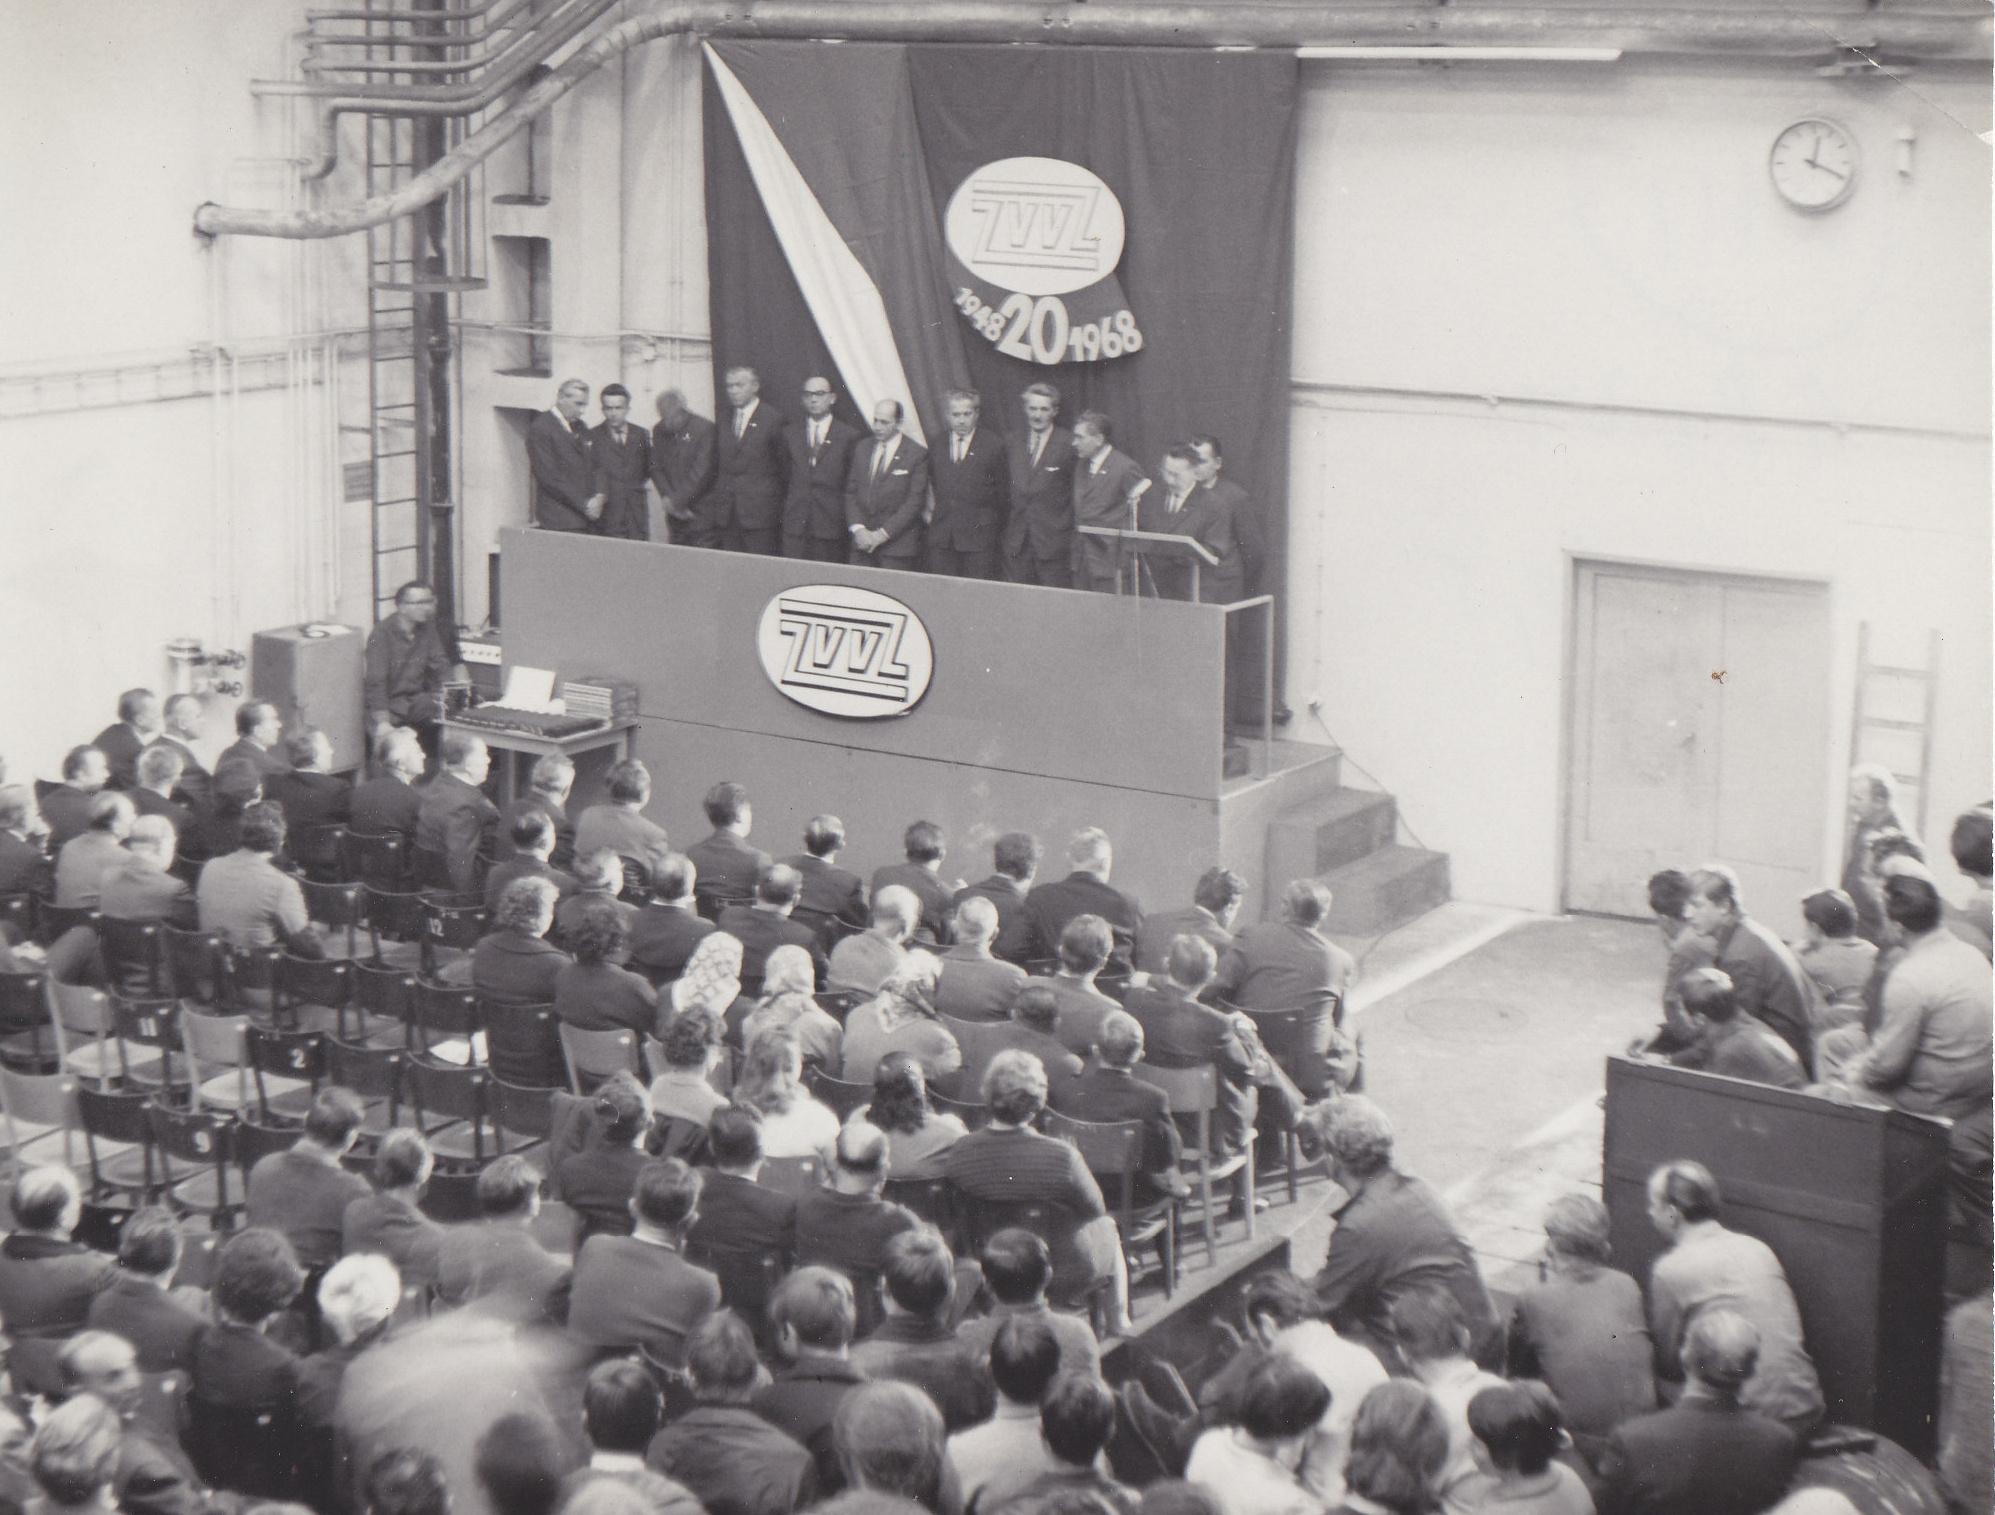 ROK 1968 V ZVVZ